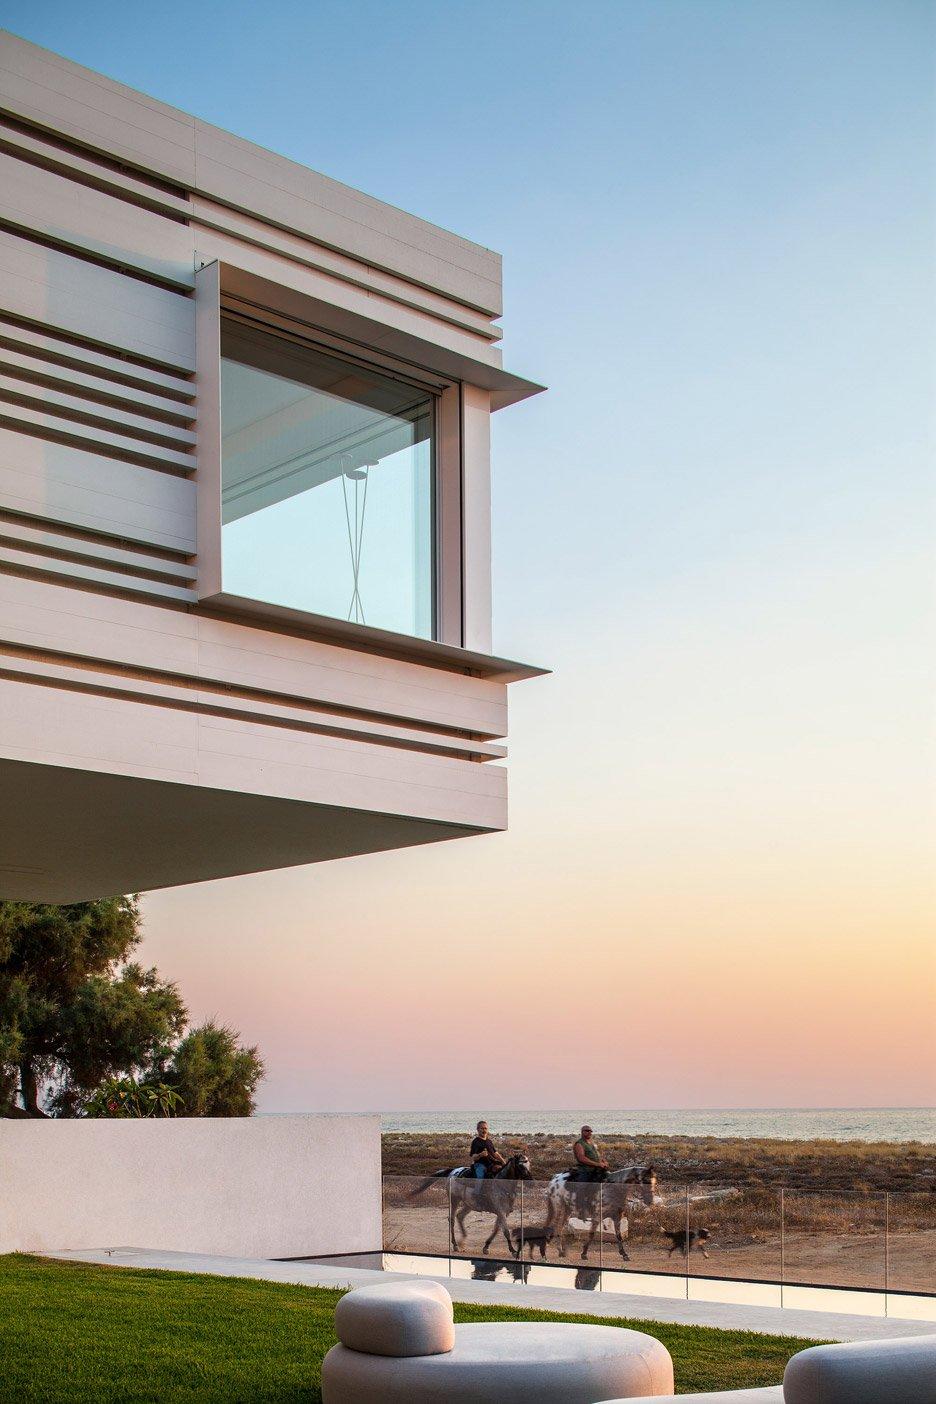 A House By The Sea by Pitsou Kedem